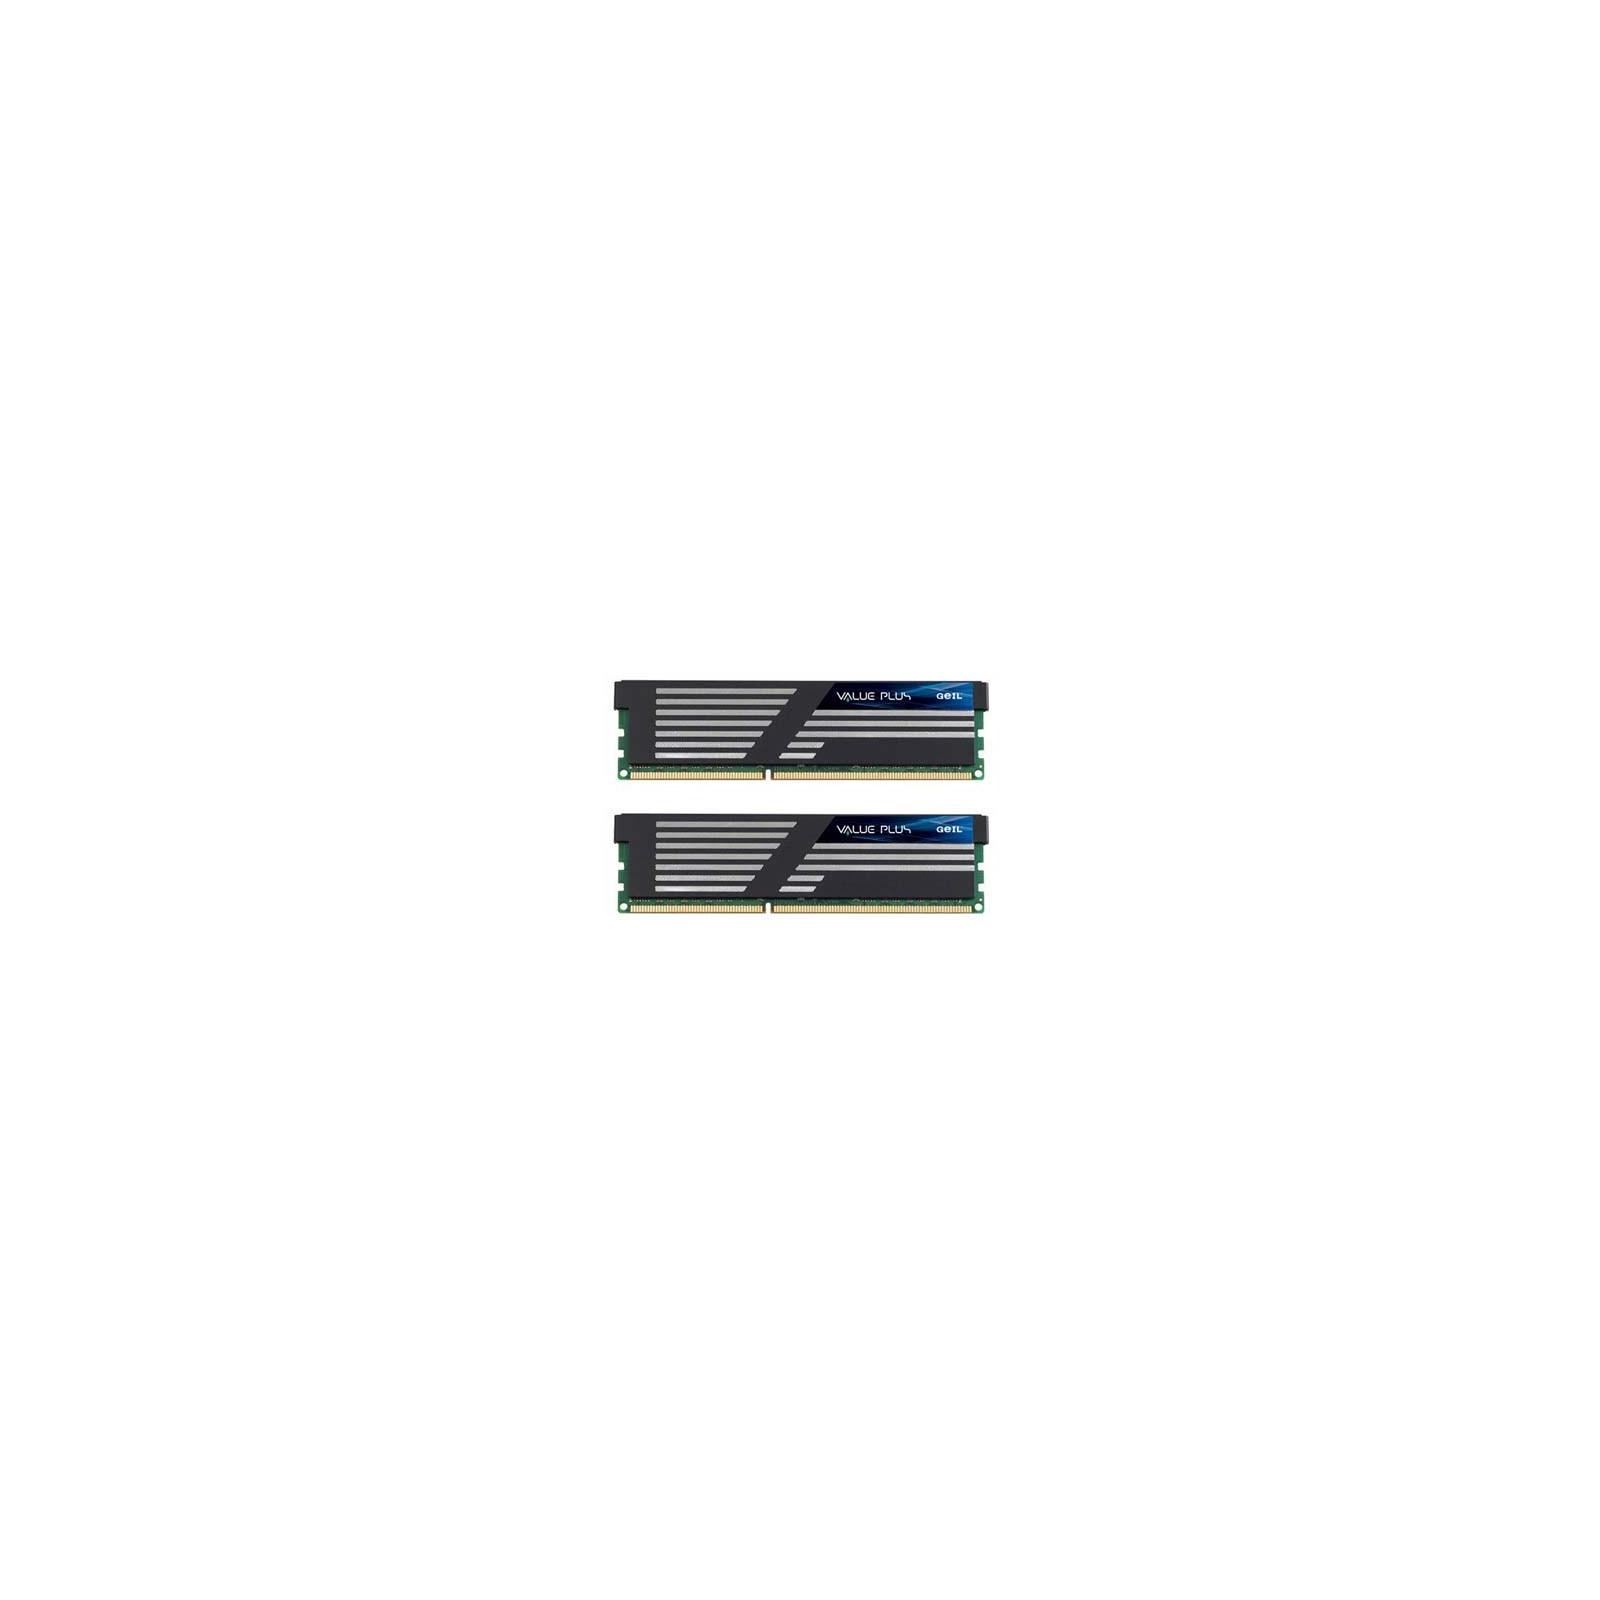 Модуль памяти для компьютера DDR3 8GB (2x4GB) 1333 MHz GEIL (GVP38GB1333C9DC)